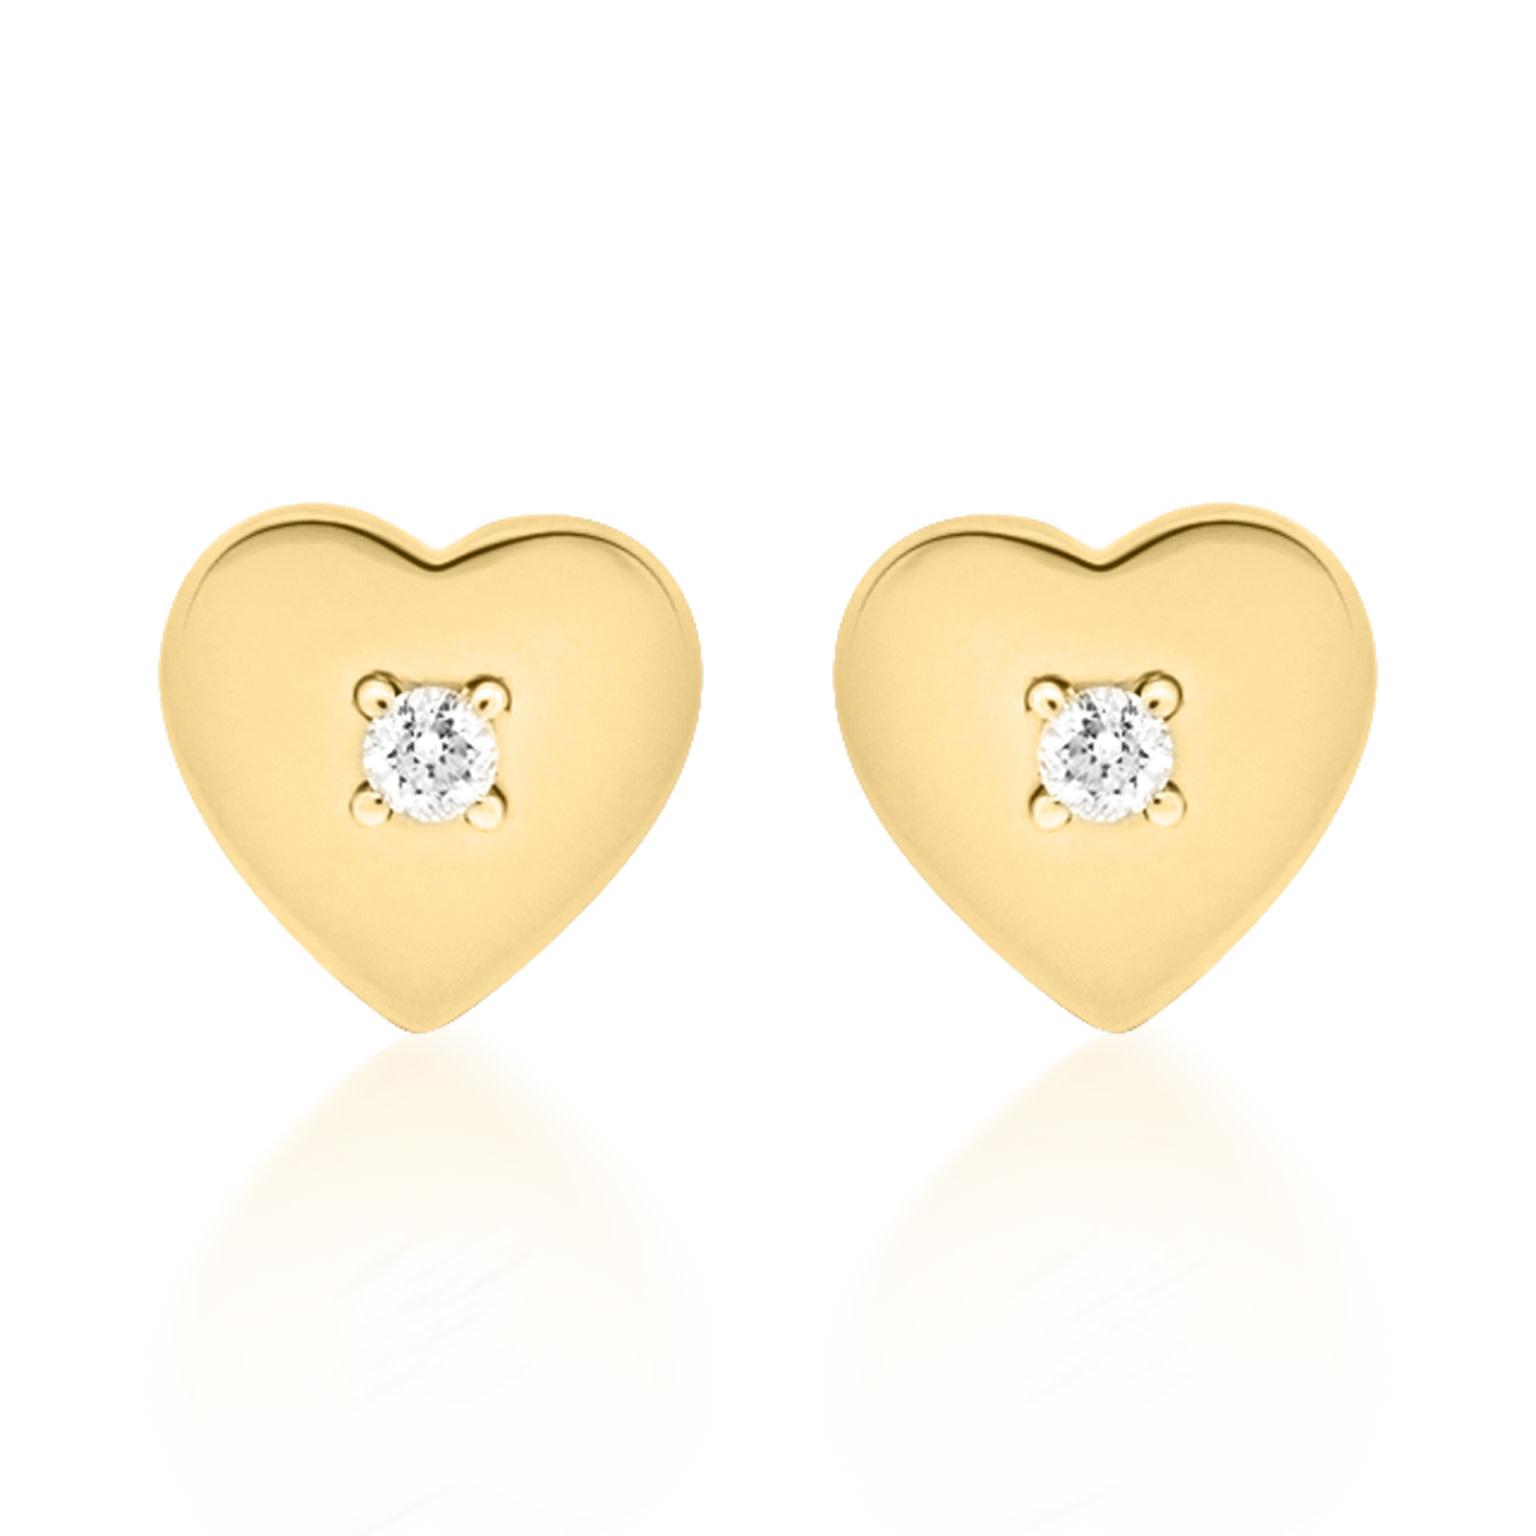 Trabert Goldsmiths Polished Gold Heart and Diamond Stud Earrings